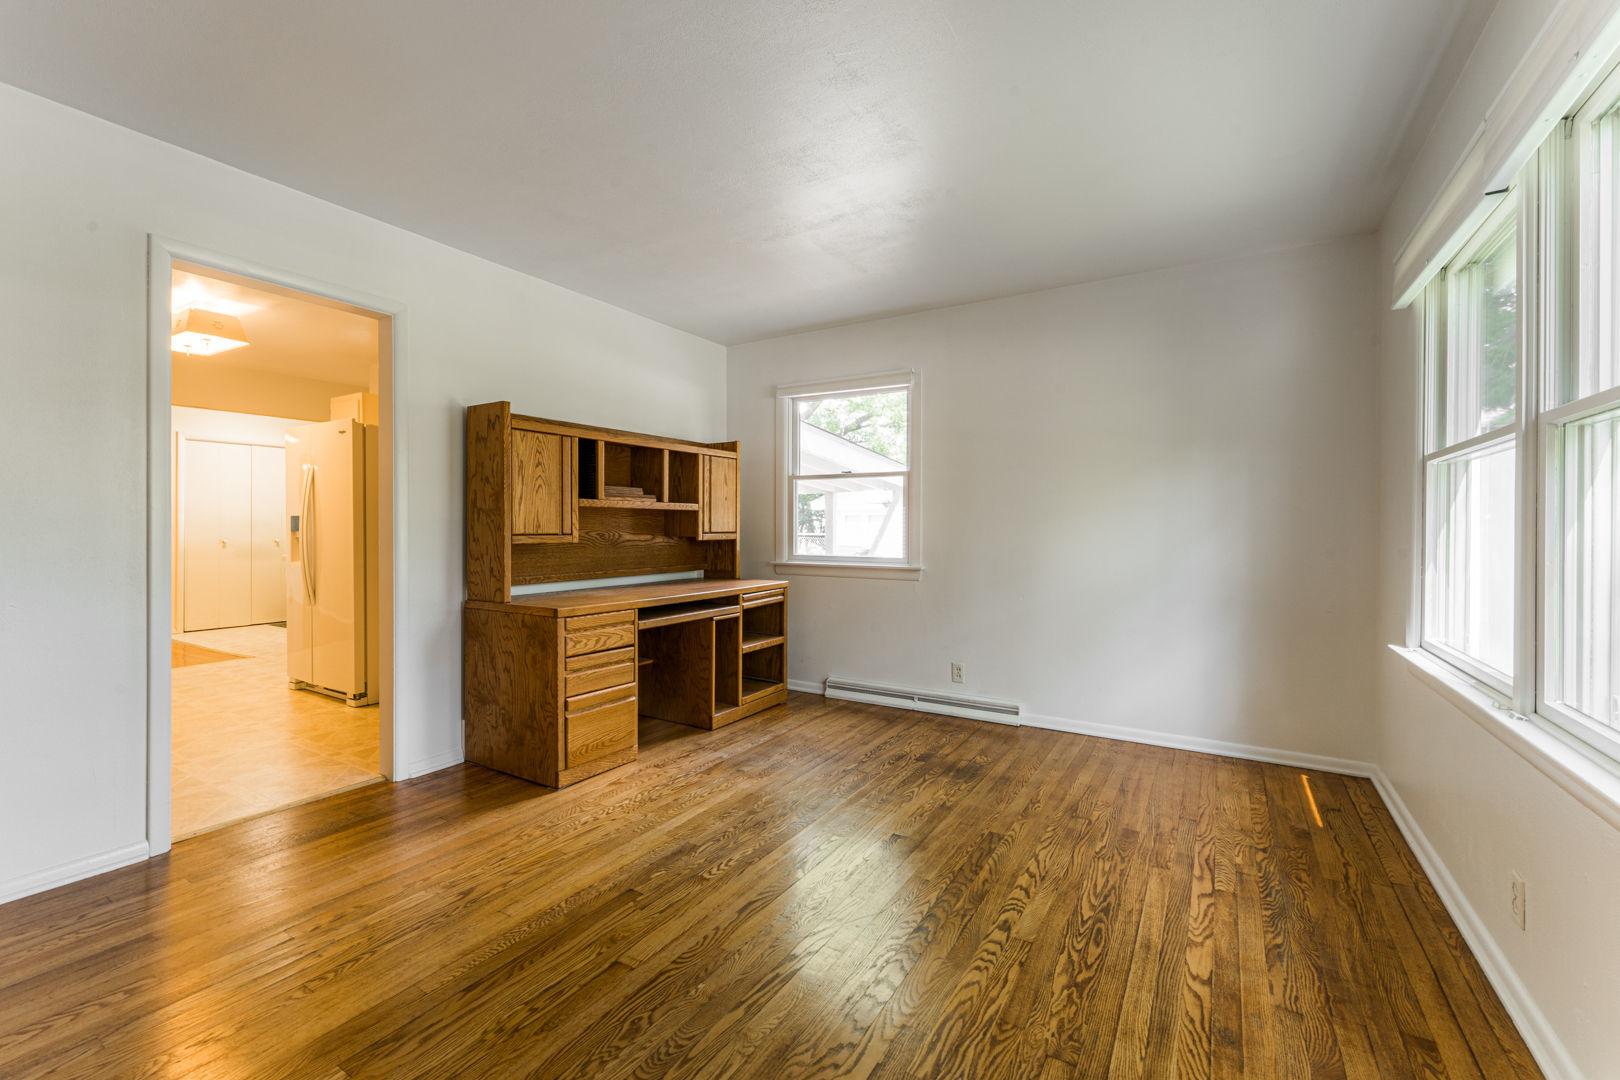 231 River Drive, DeKalb, Illinois 60115, 3 Bedrooms Bedrooms, ,2 BathroomsBathrooms,Residential,For Sale,River,MRD11155899